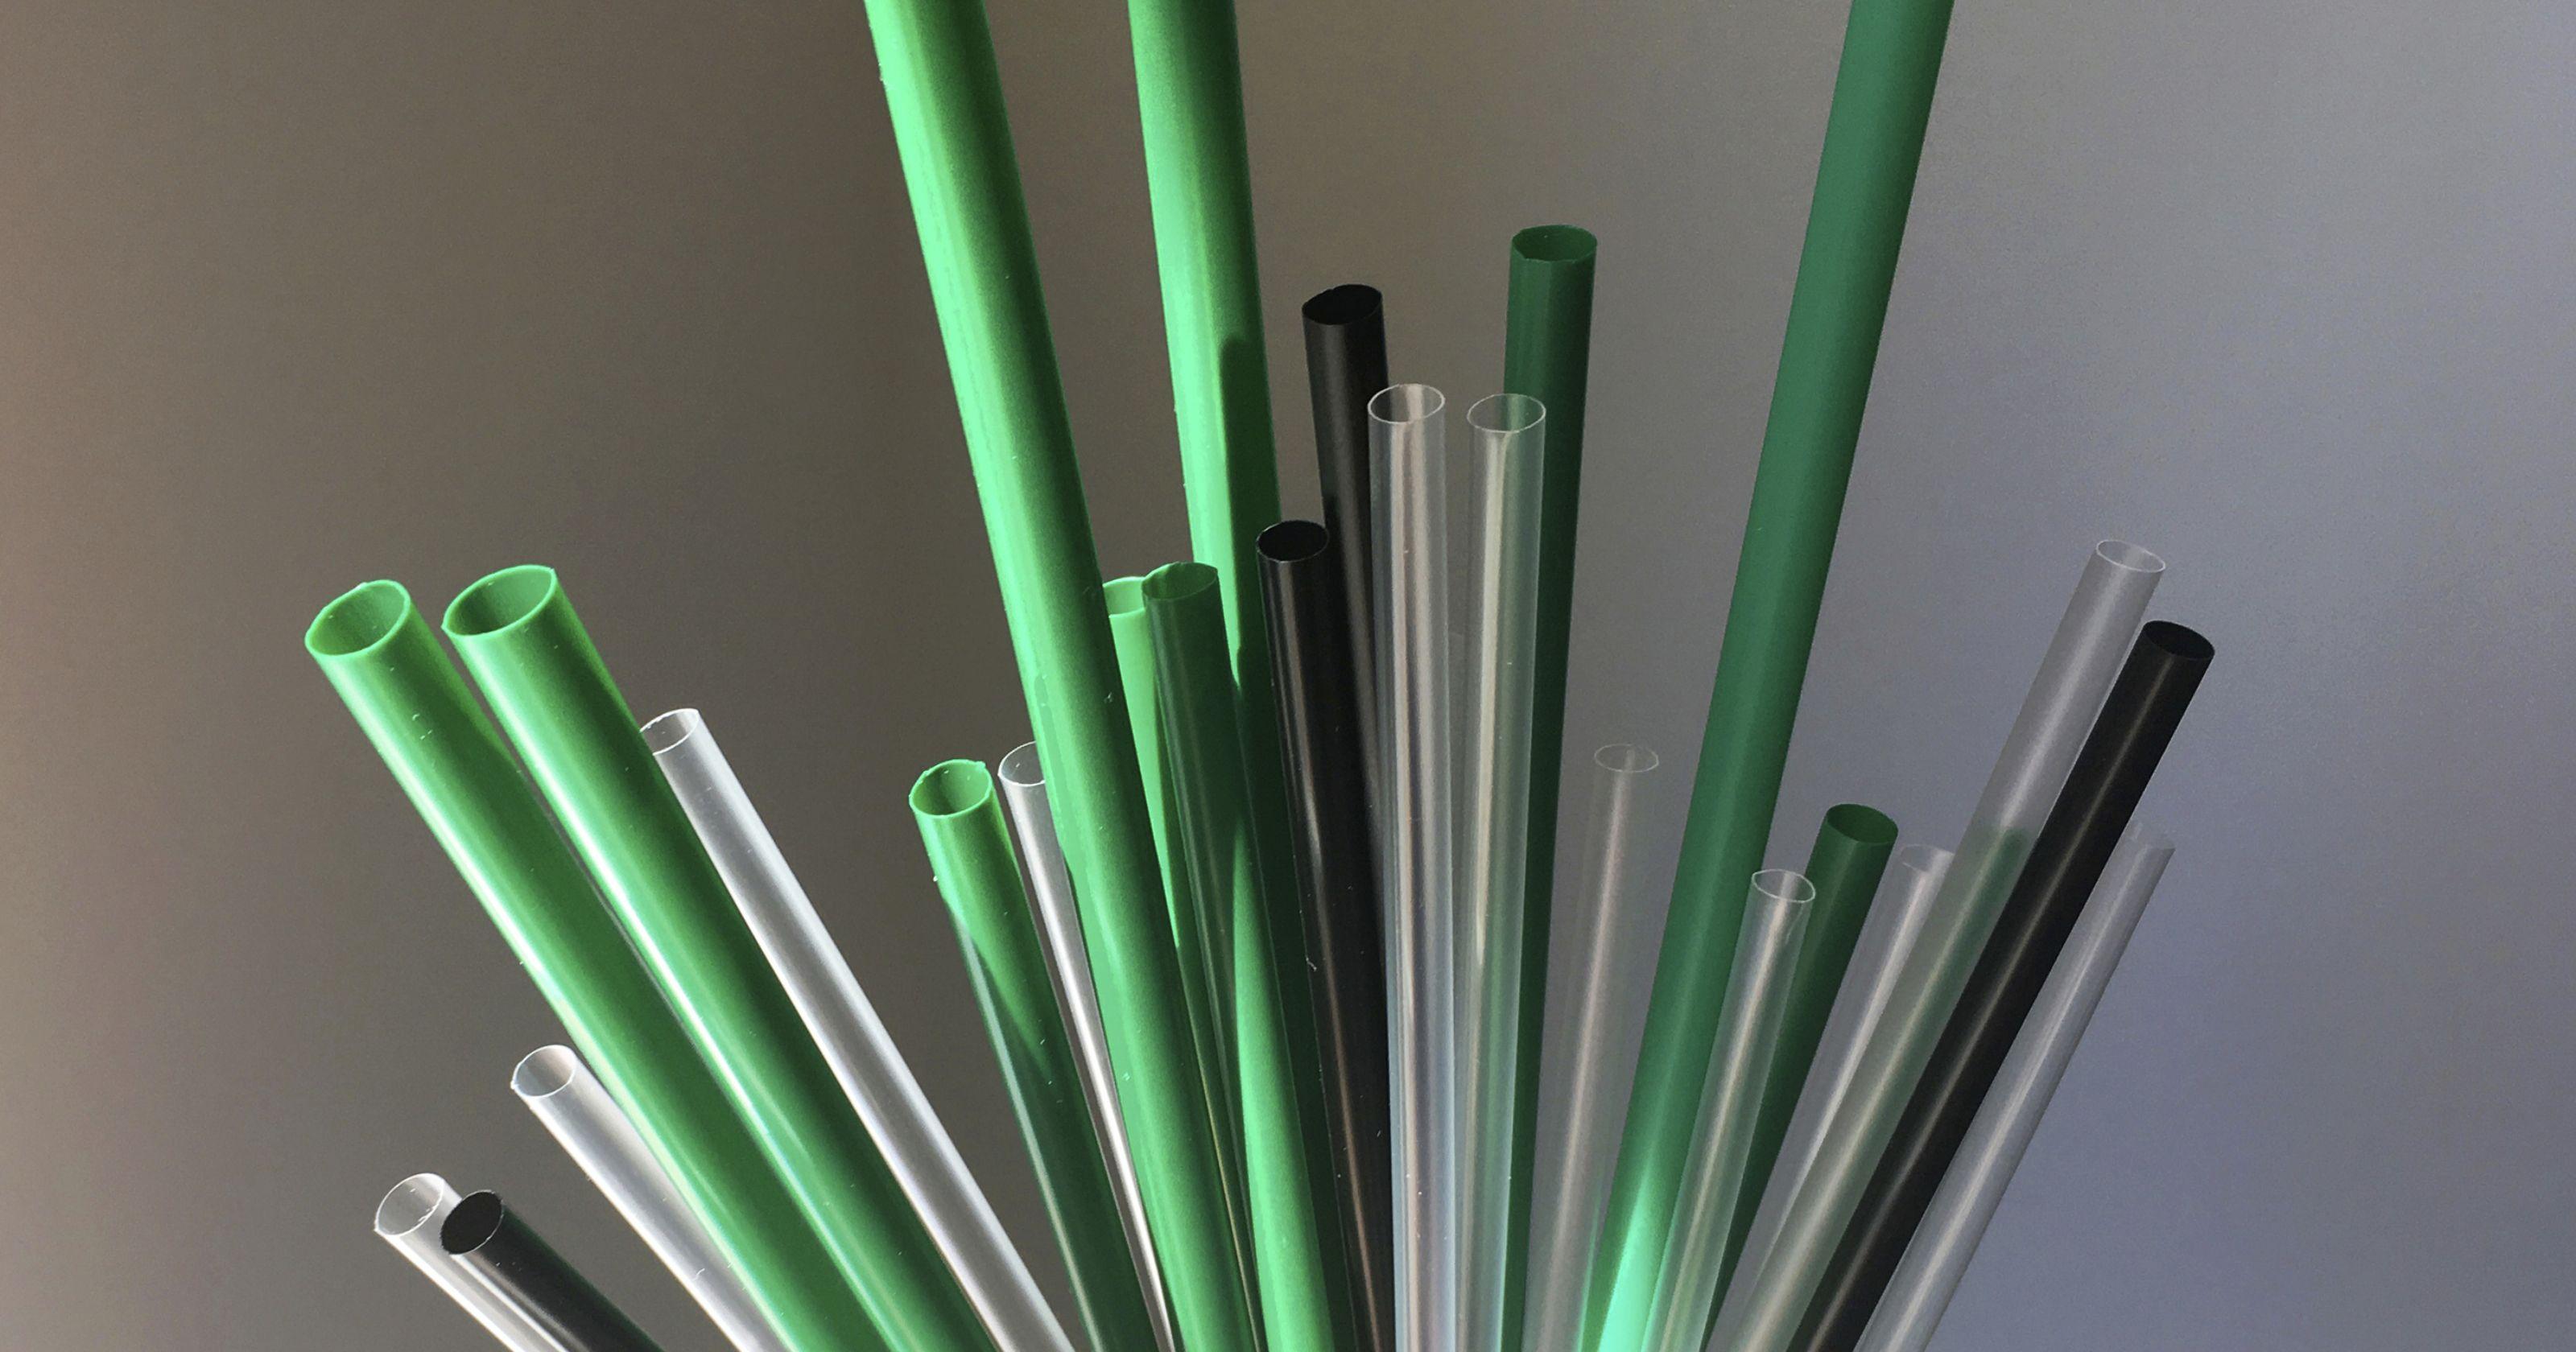 Seattle's ban on plastic straws, utensils begins in July